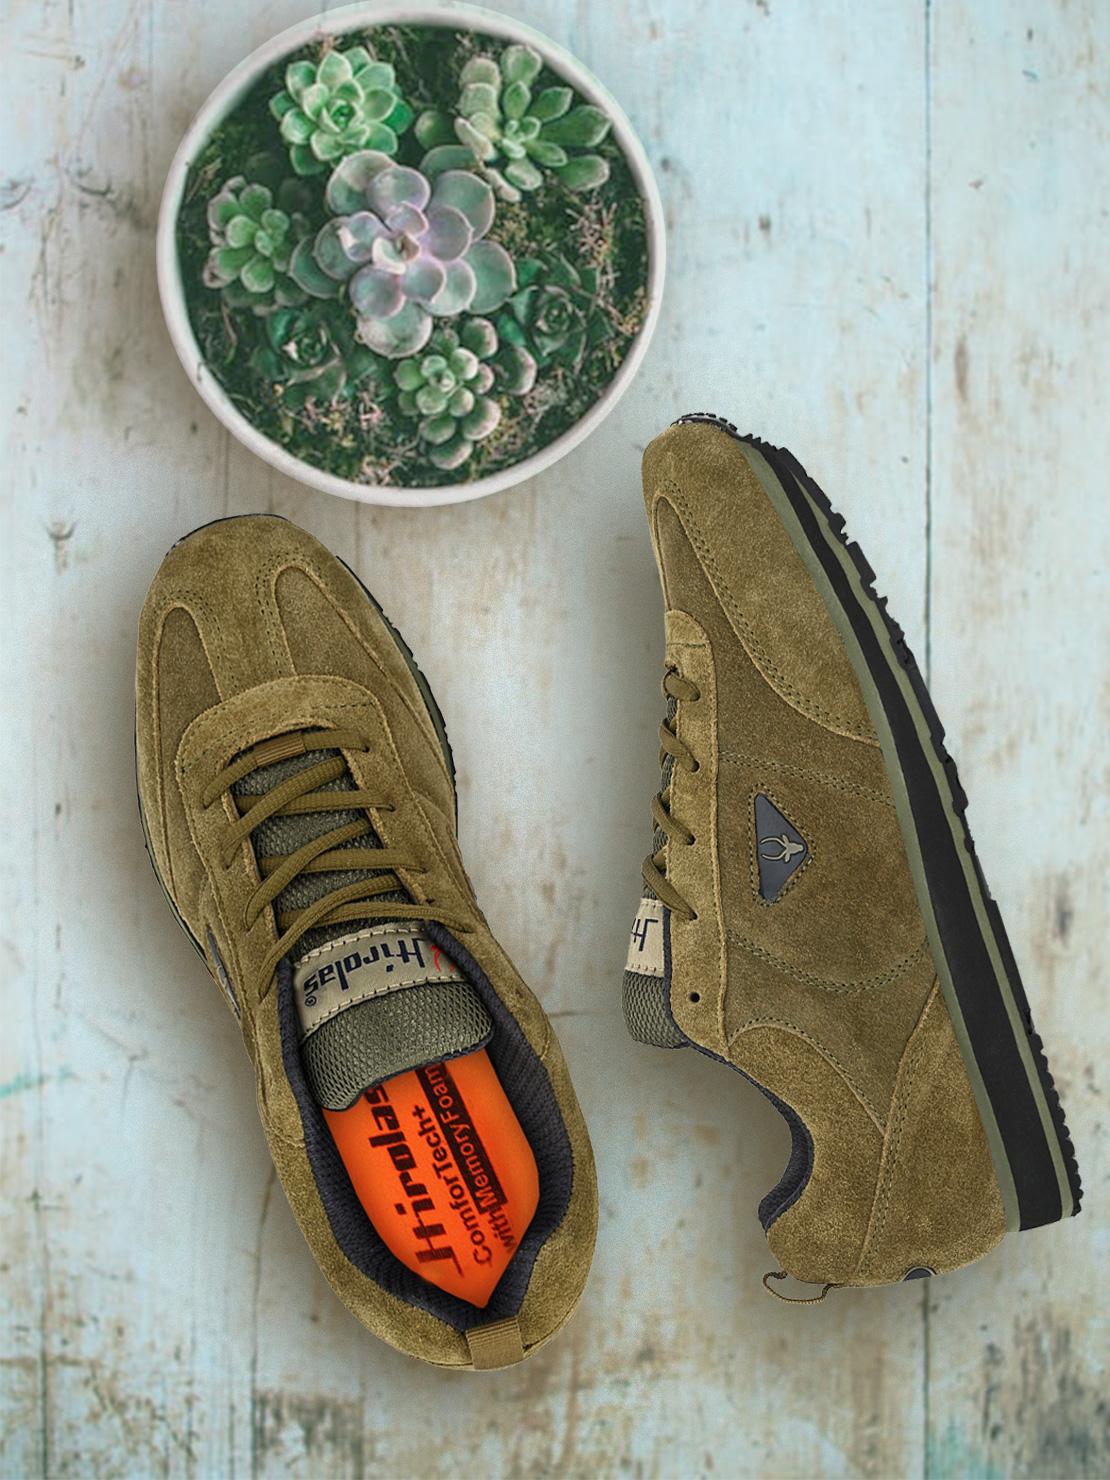 Hirolas | Hirolas® Men's Leather Multi Sport Shock Absorbing Walking  Running Fitness Athletic Training Sneaker Shoes - Olive